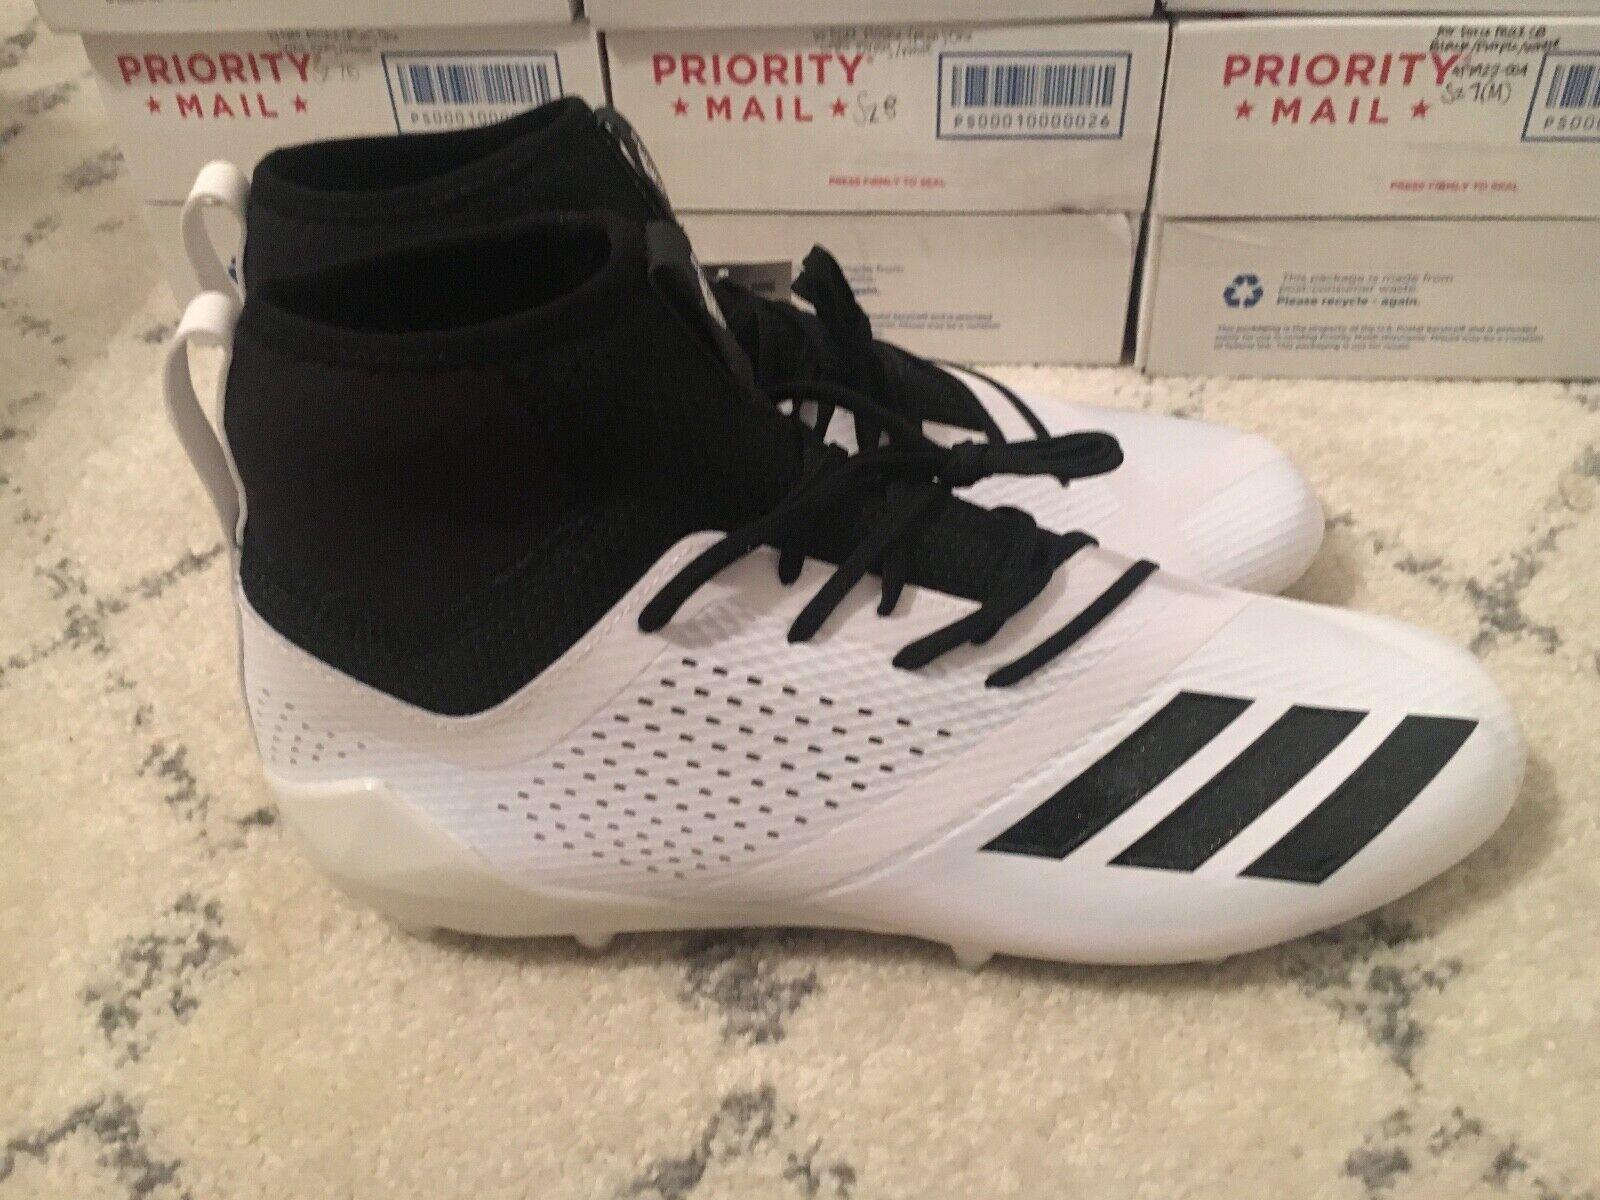 Adidas Adizero 5-Star 7.0 SK Football Cleats White Black CQ0